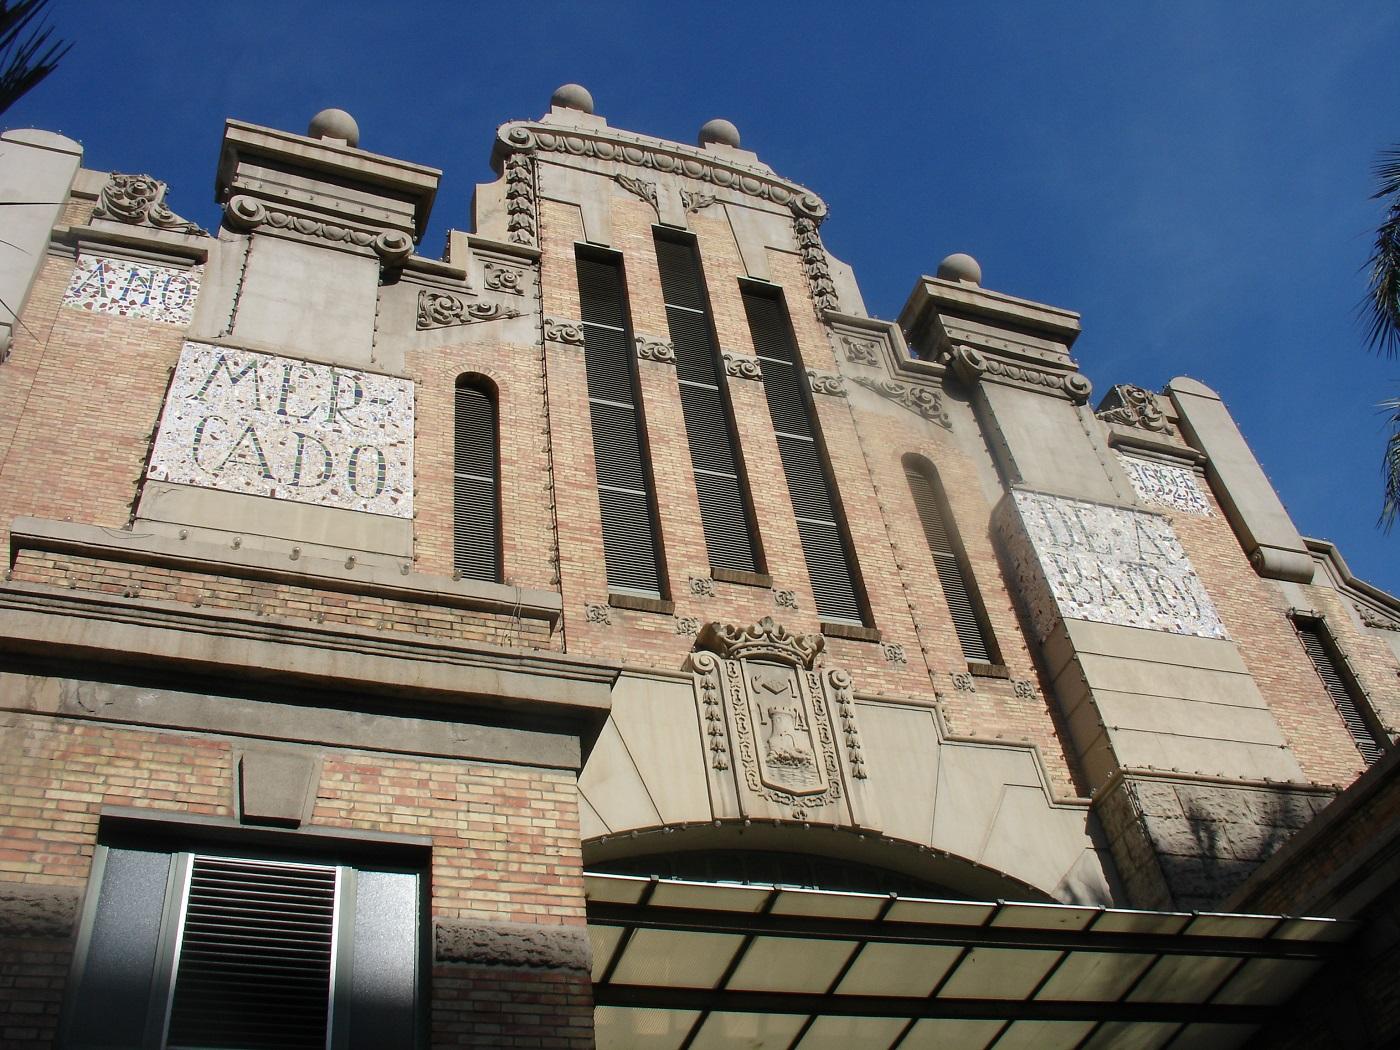 Edificios hist ricos alicante city experience for Casa domingo alicante